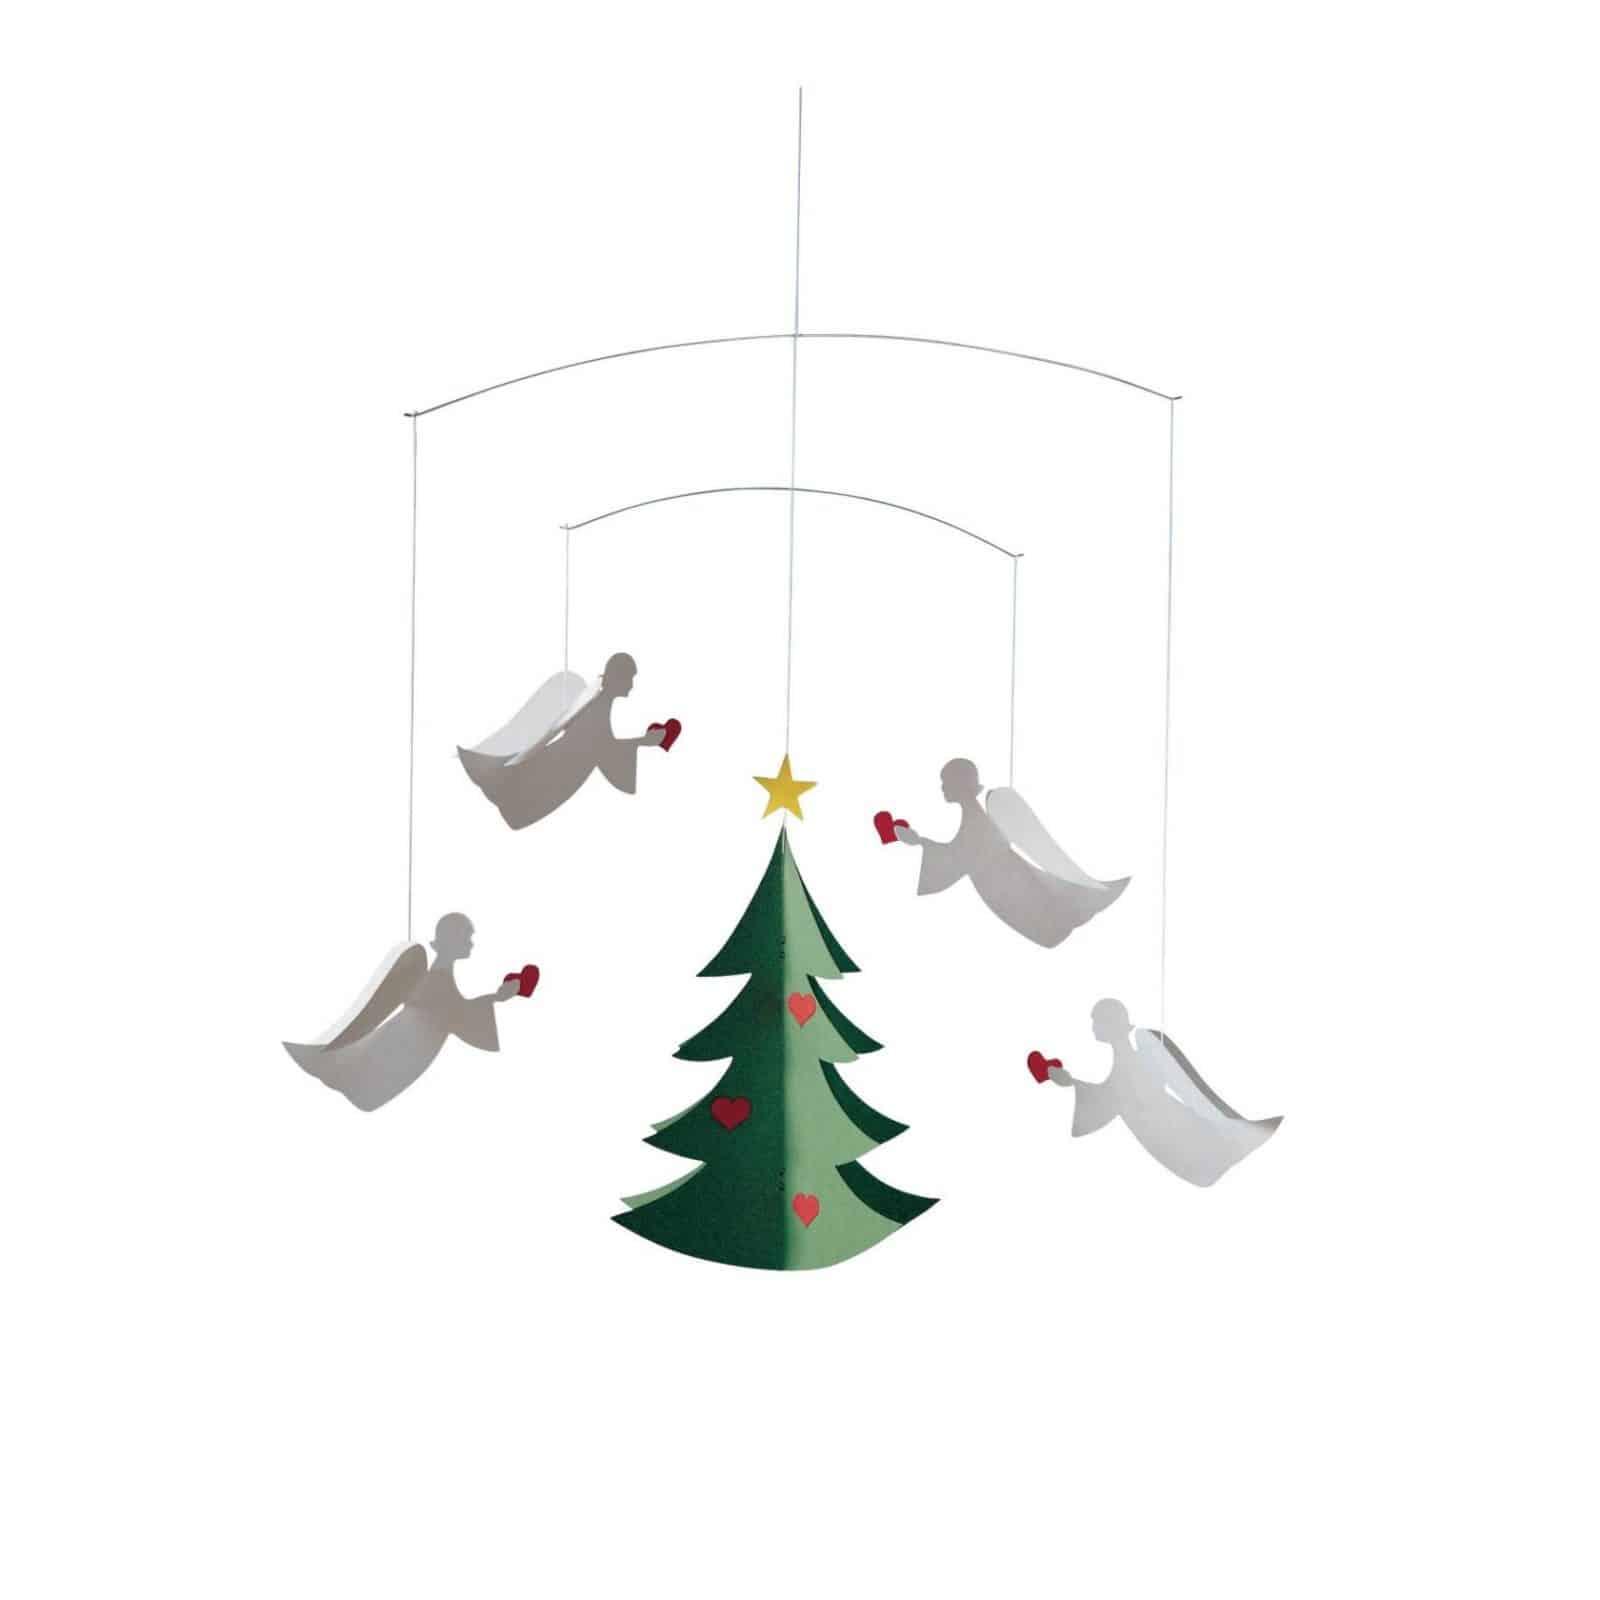 Skandi style Christmas decor